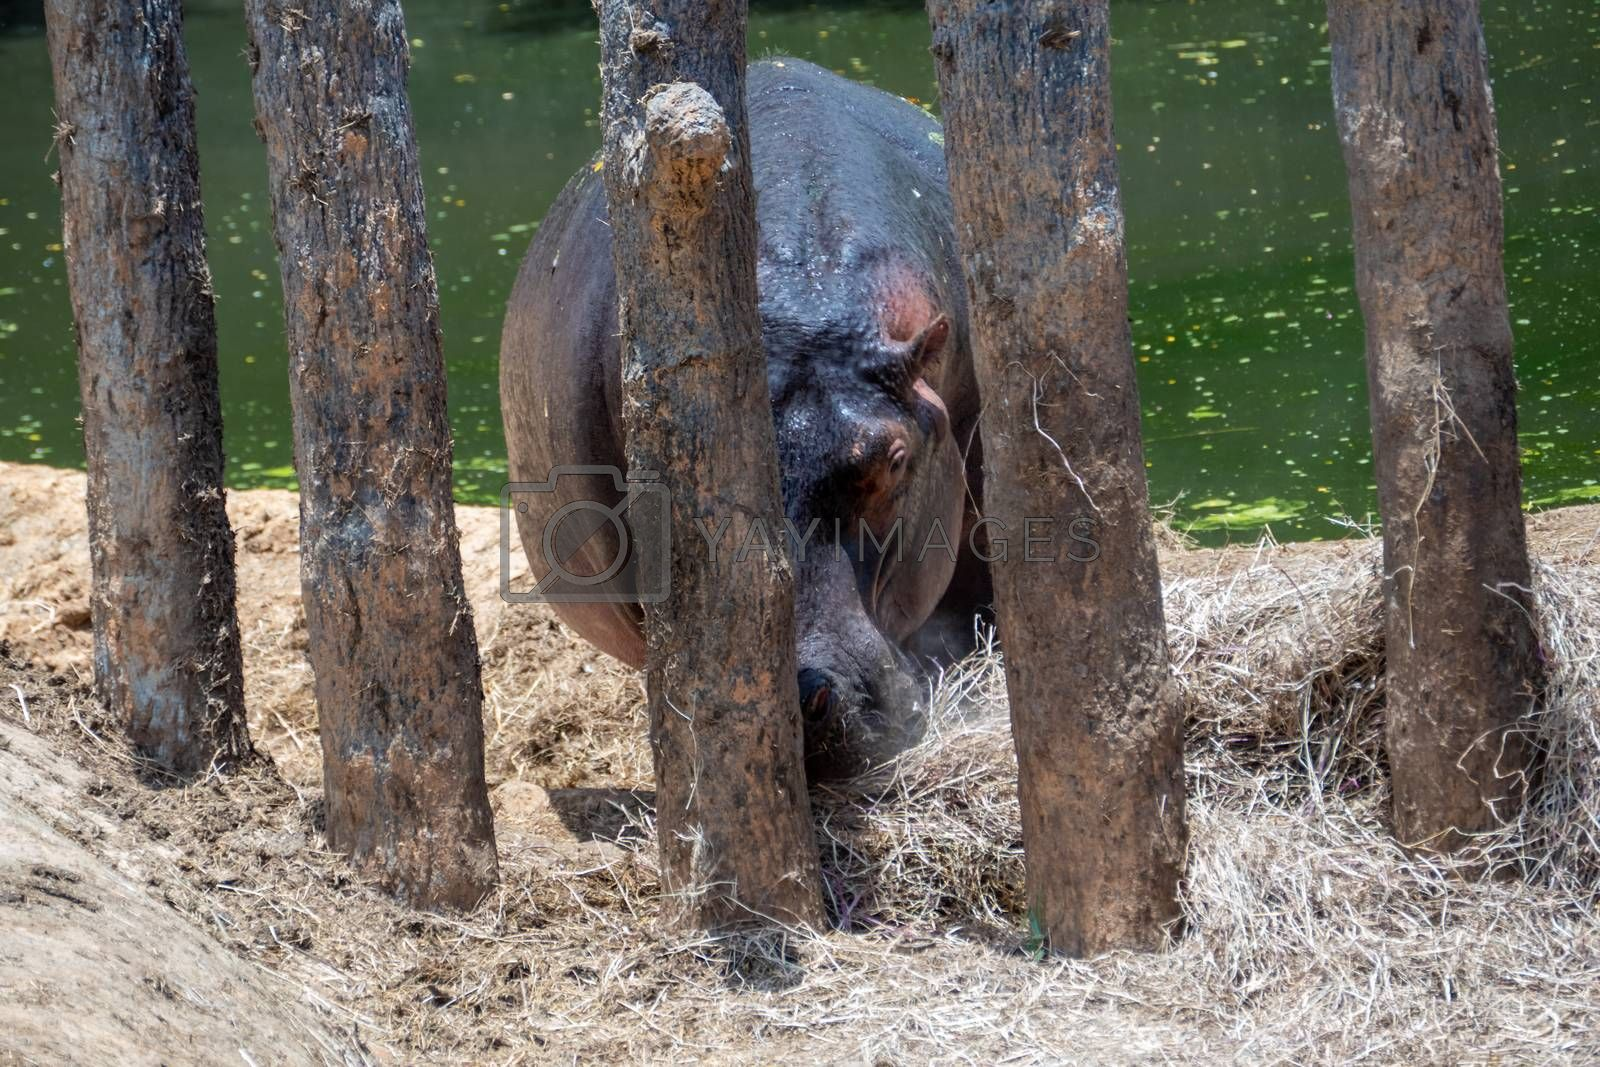 Rhinoceros in enlosed area by lake